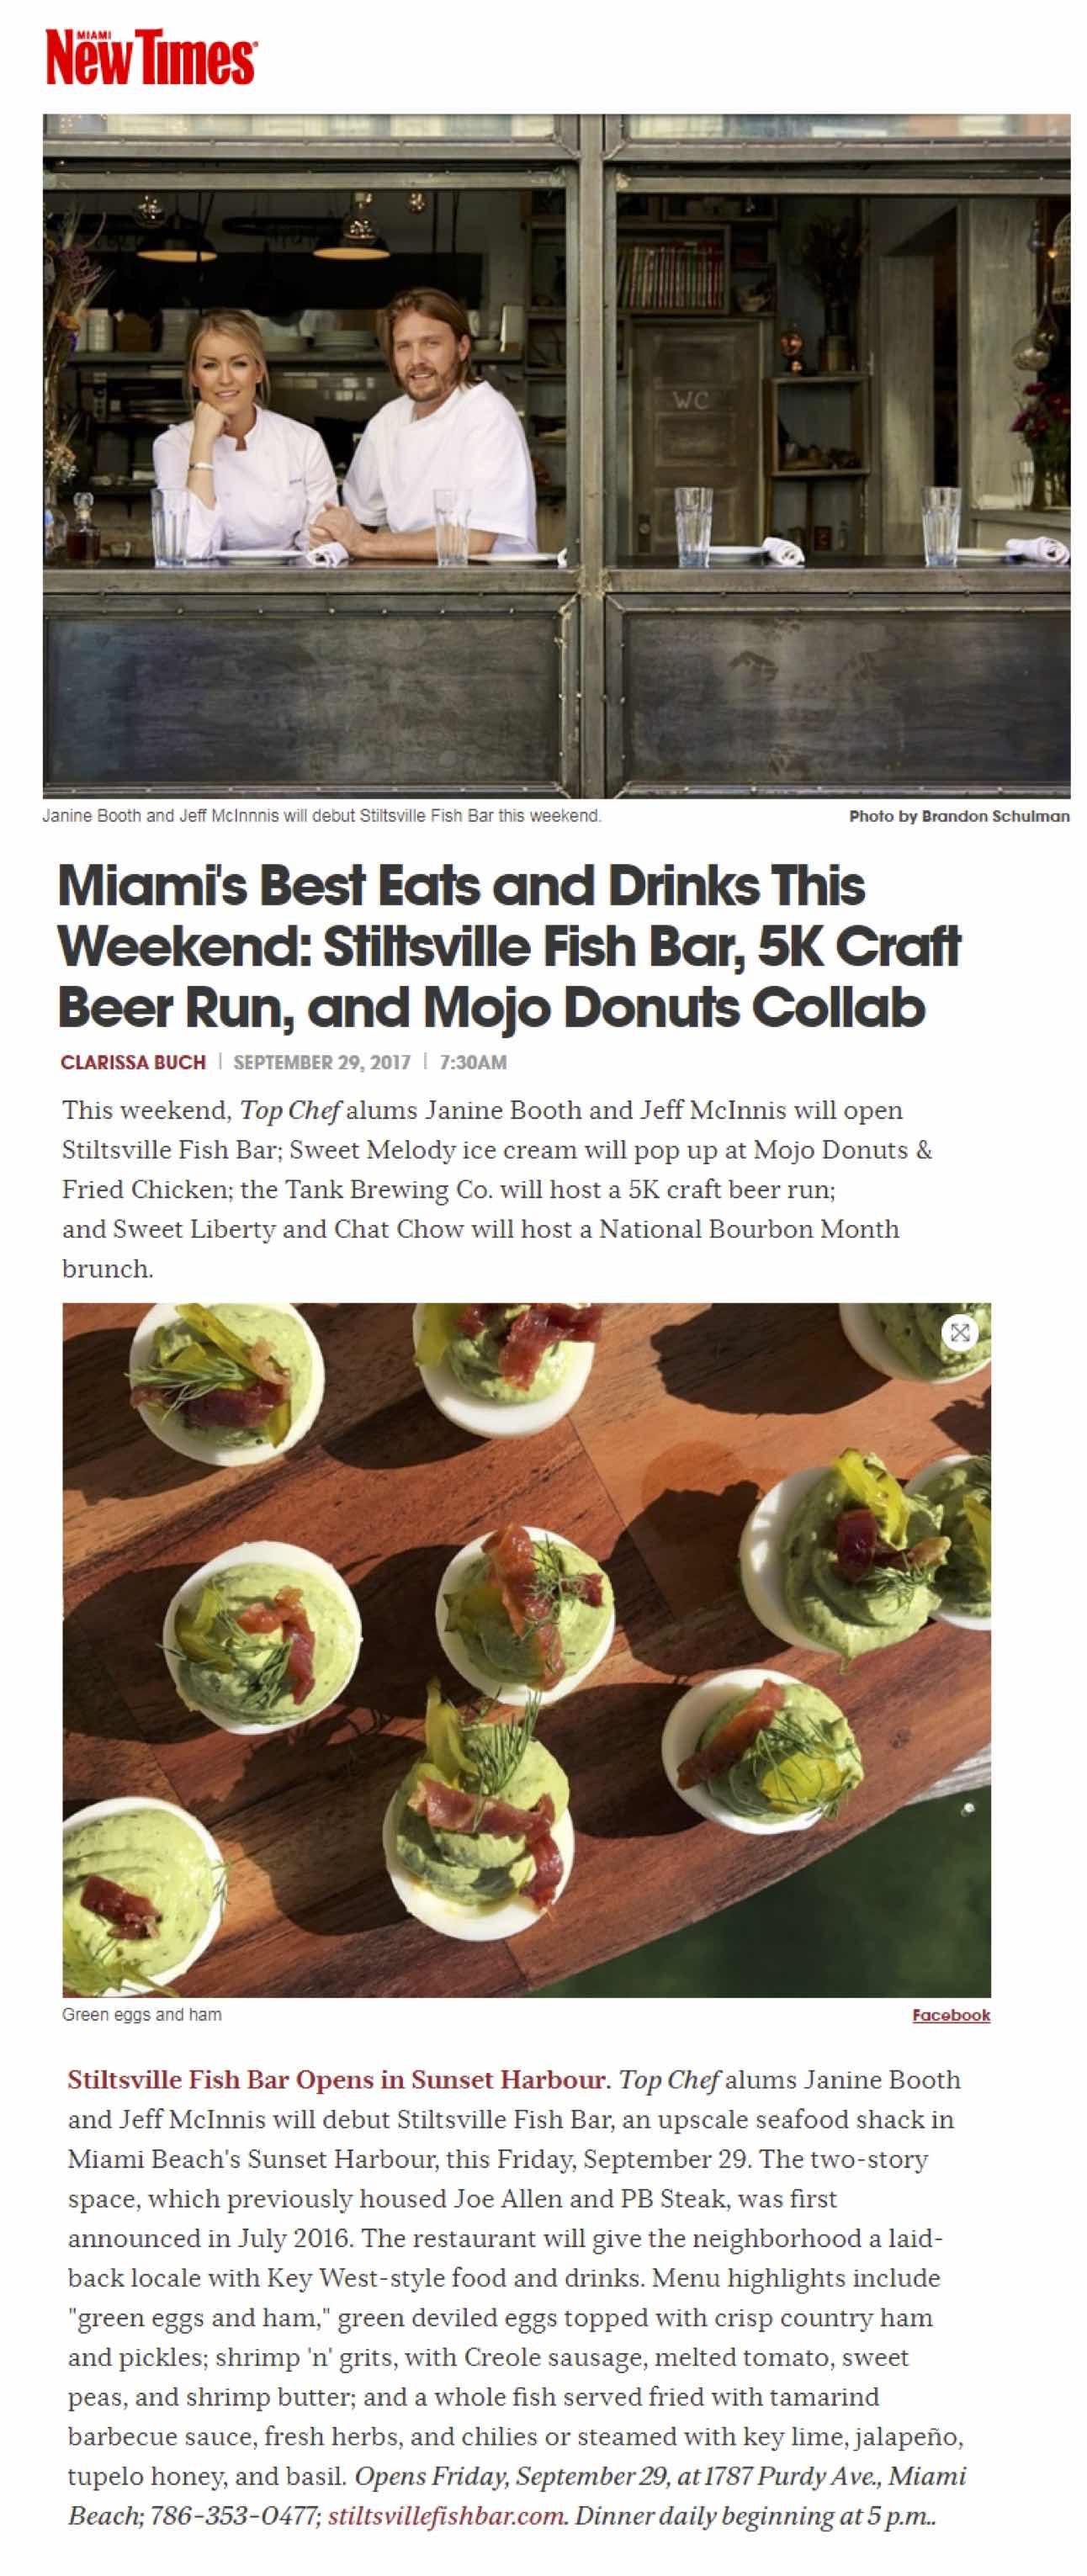 MiamiNewTimes.com 9-29-17.jpg